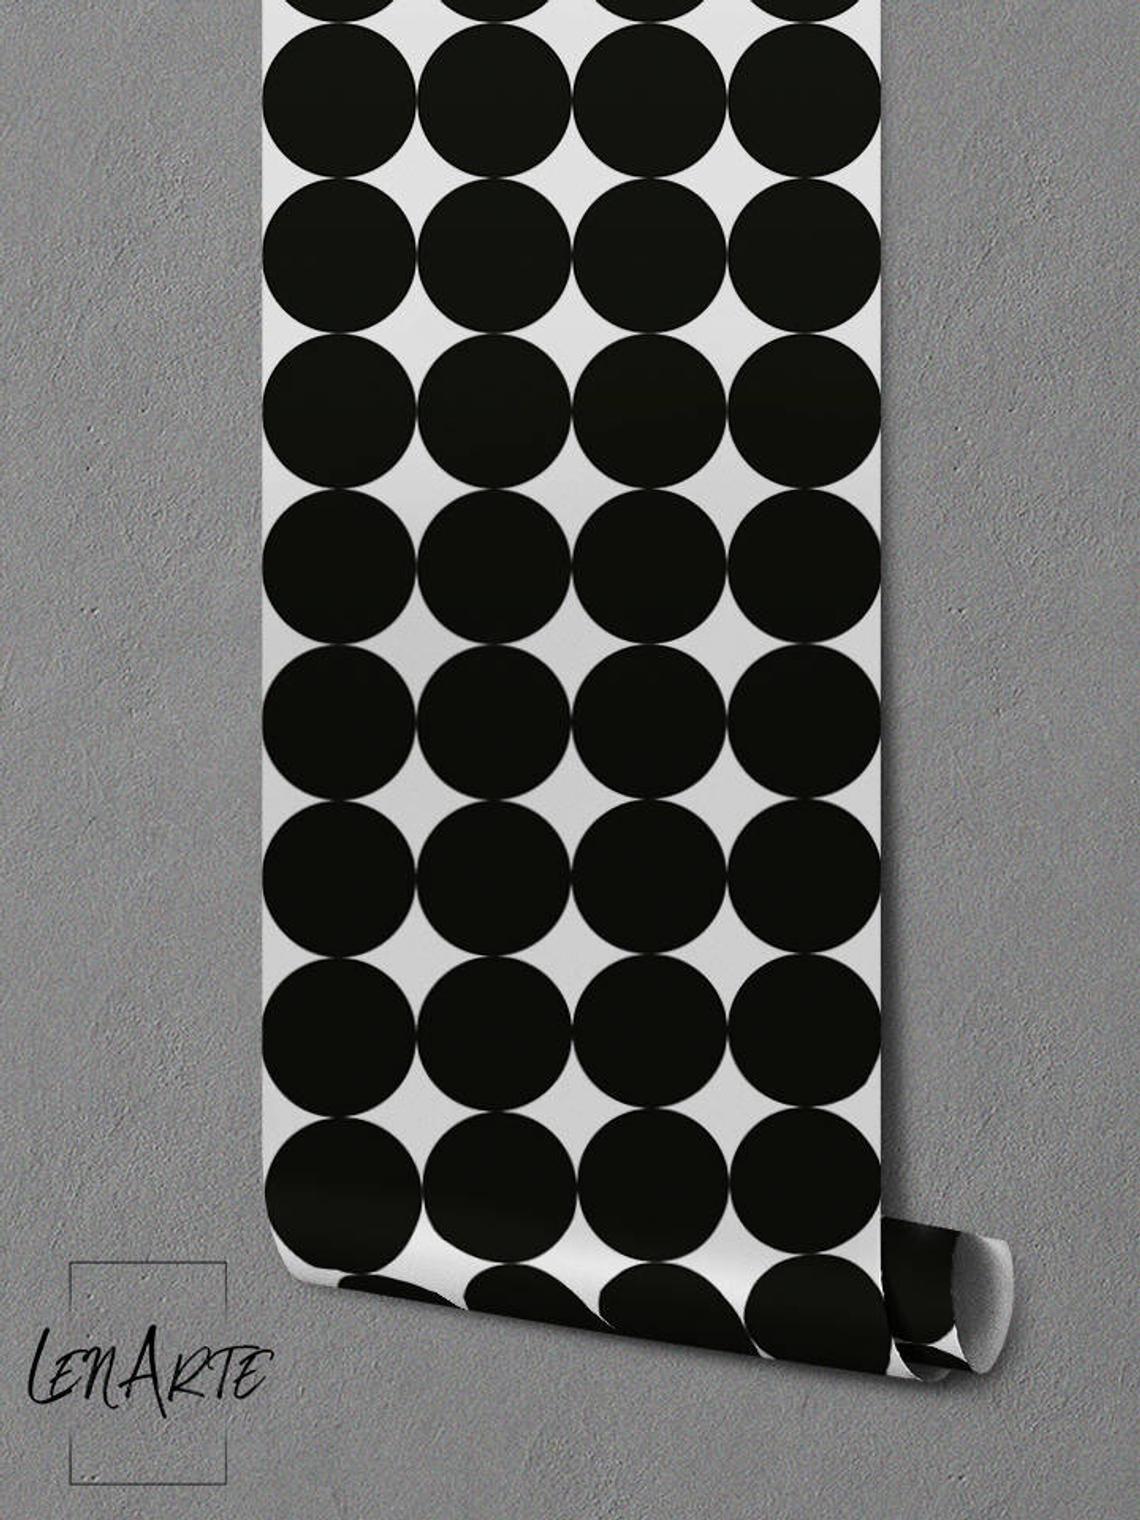 Black Giant Dots Wallpaper Dot Pattern Black and White